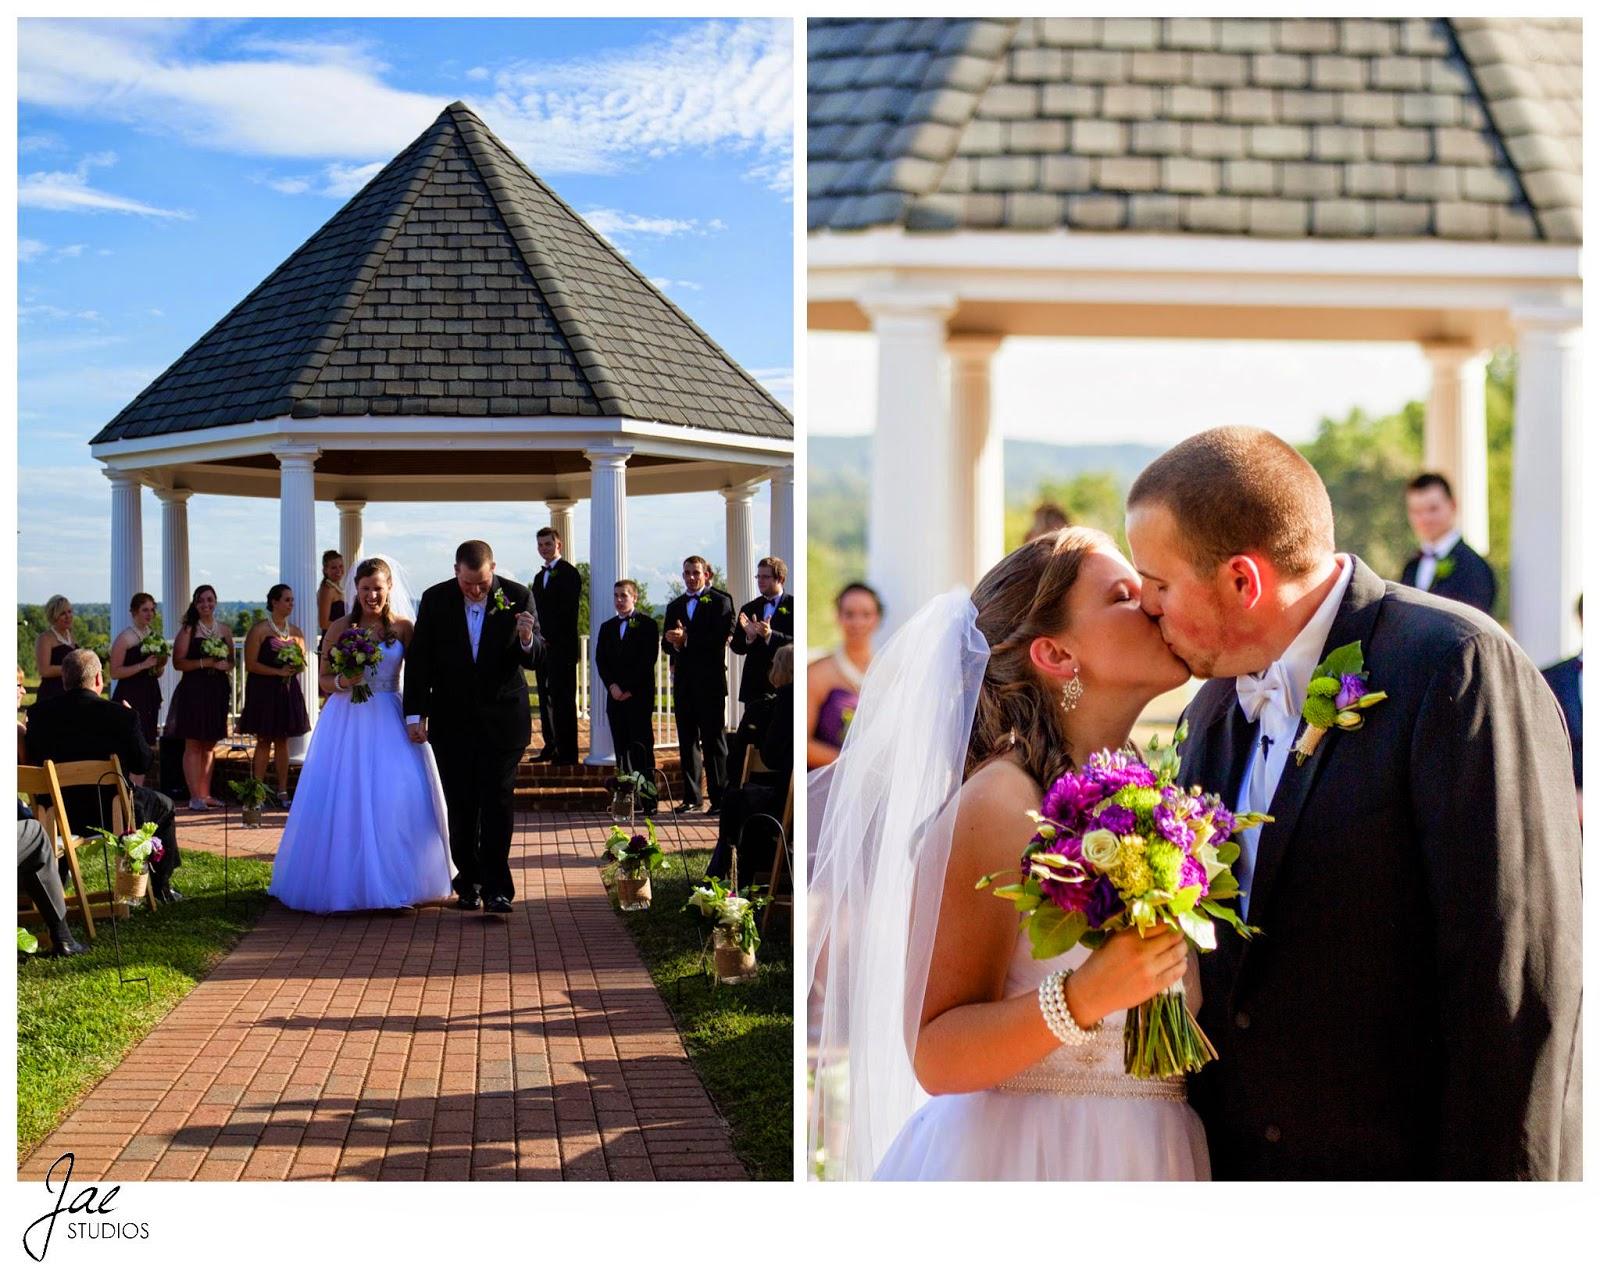 Jonathan and Julie, Bird cage, West Manor Estate, Wedding, Lynchburg, Virginia, Jae Studios, wedding dress, flowers, bouquet, purple, gazebo, aisle, boutonniere, kissing